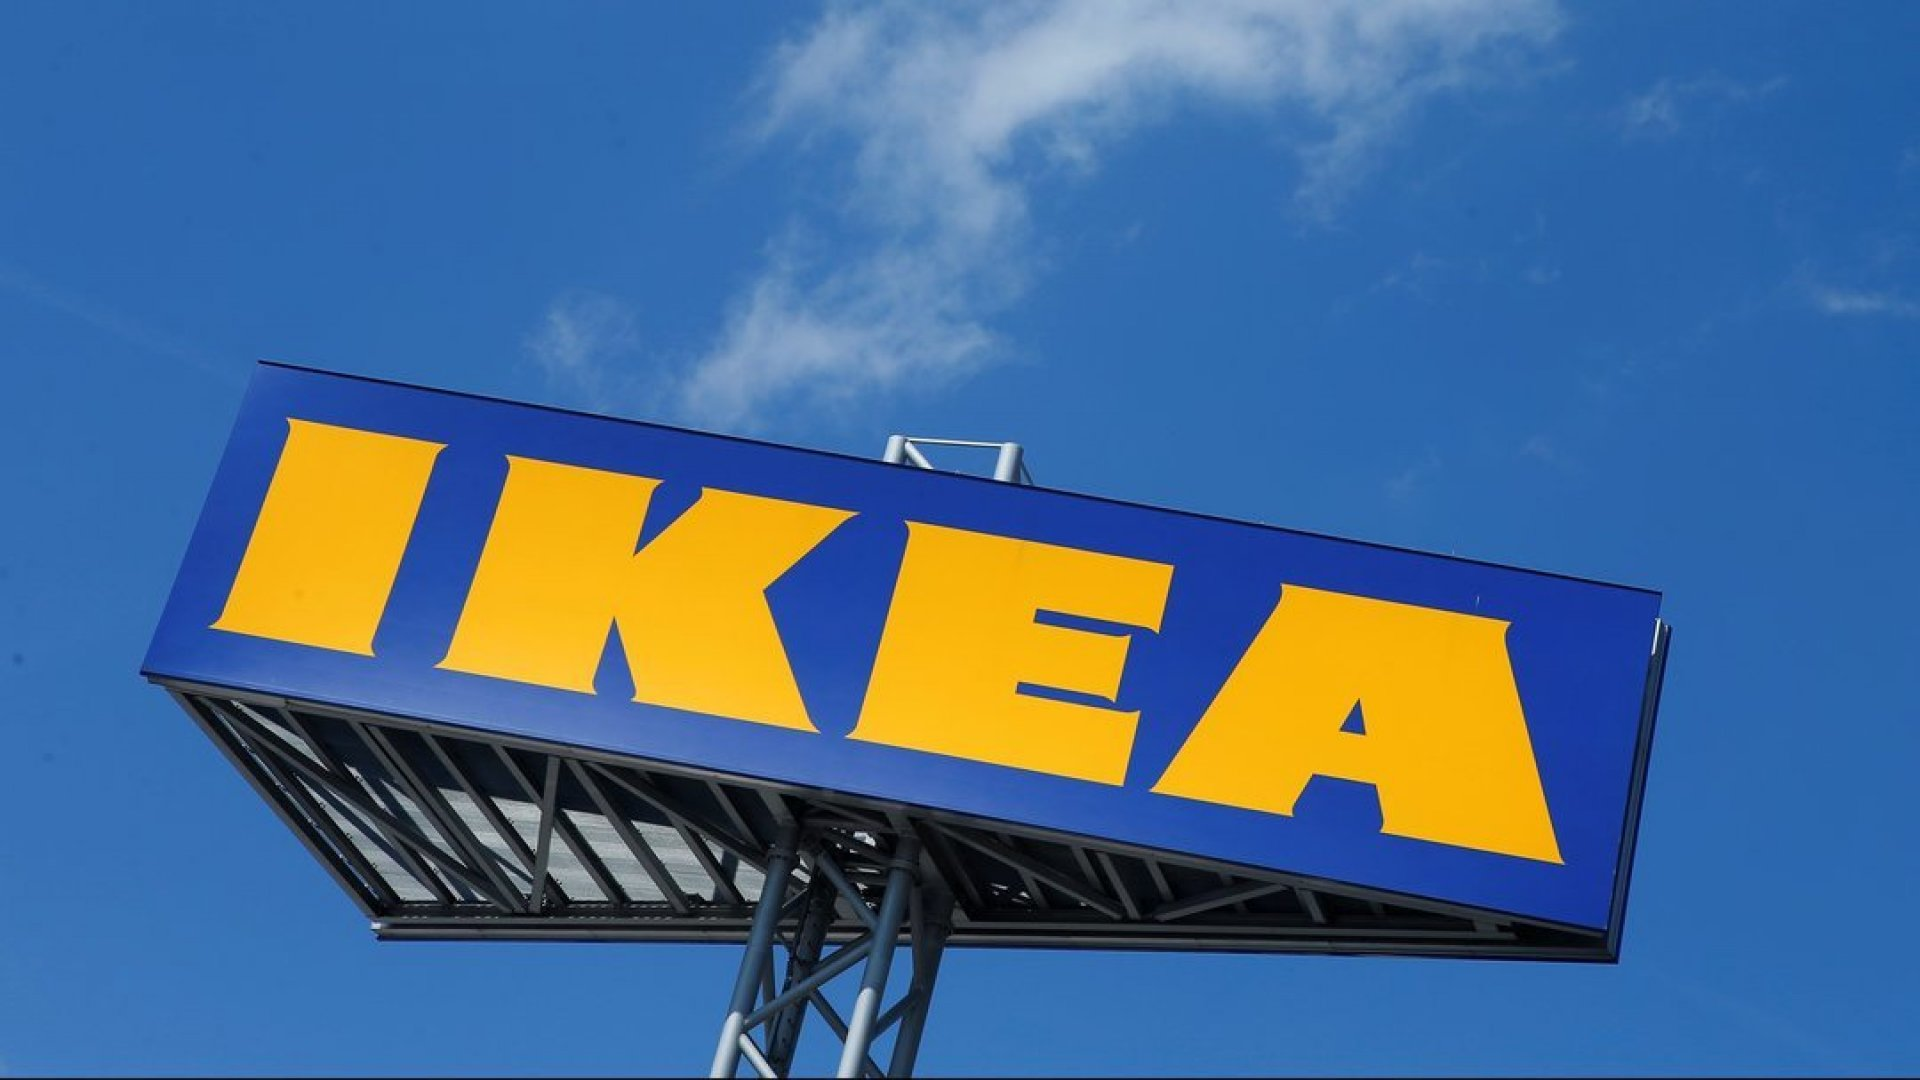 IKEA выпустила сумку сцитатой Ингвара Кампрада